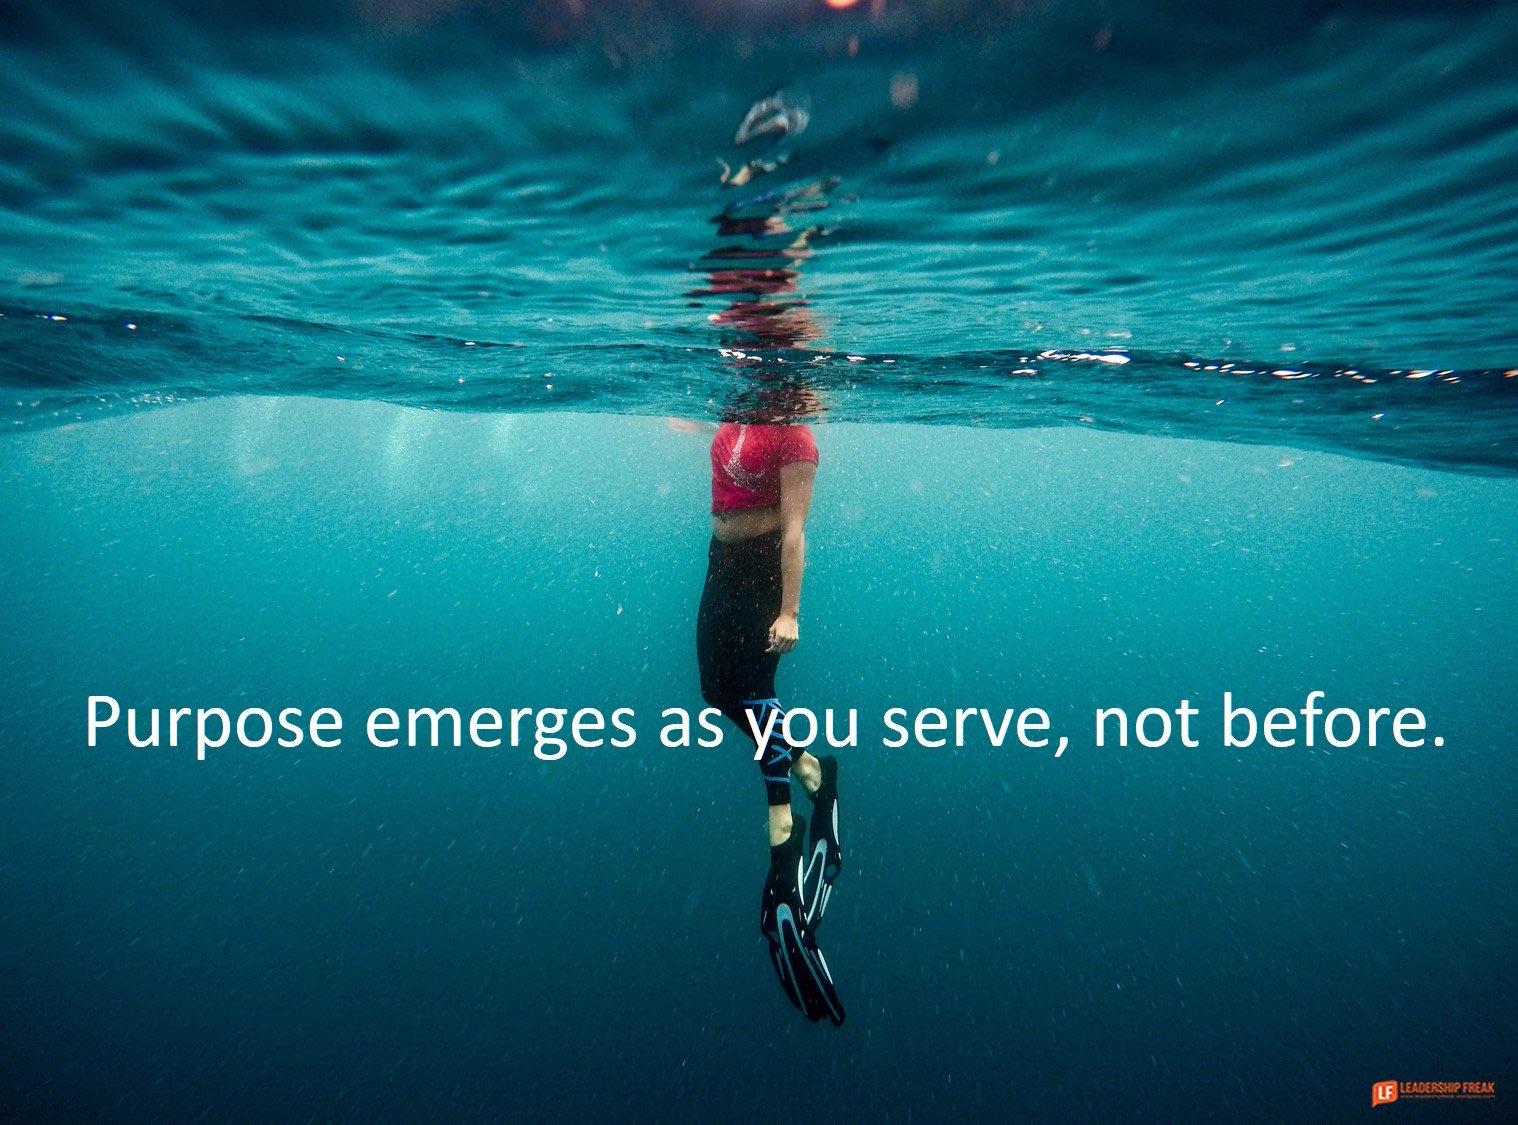 Purpose emerges